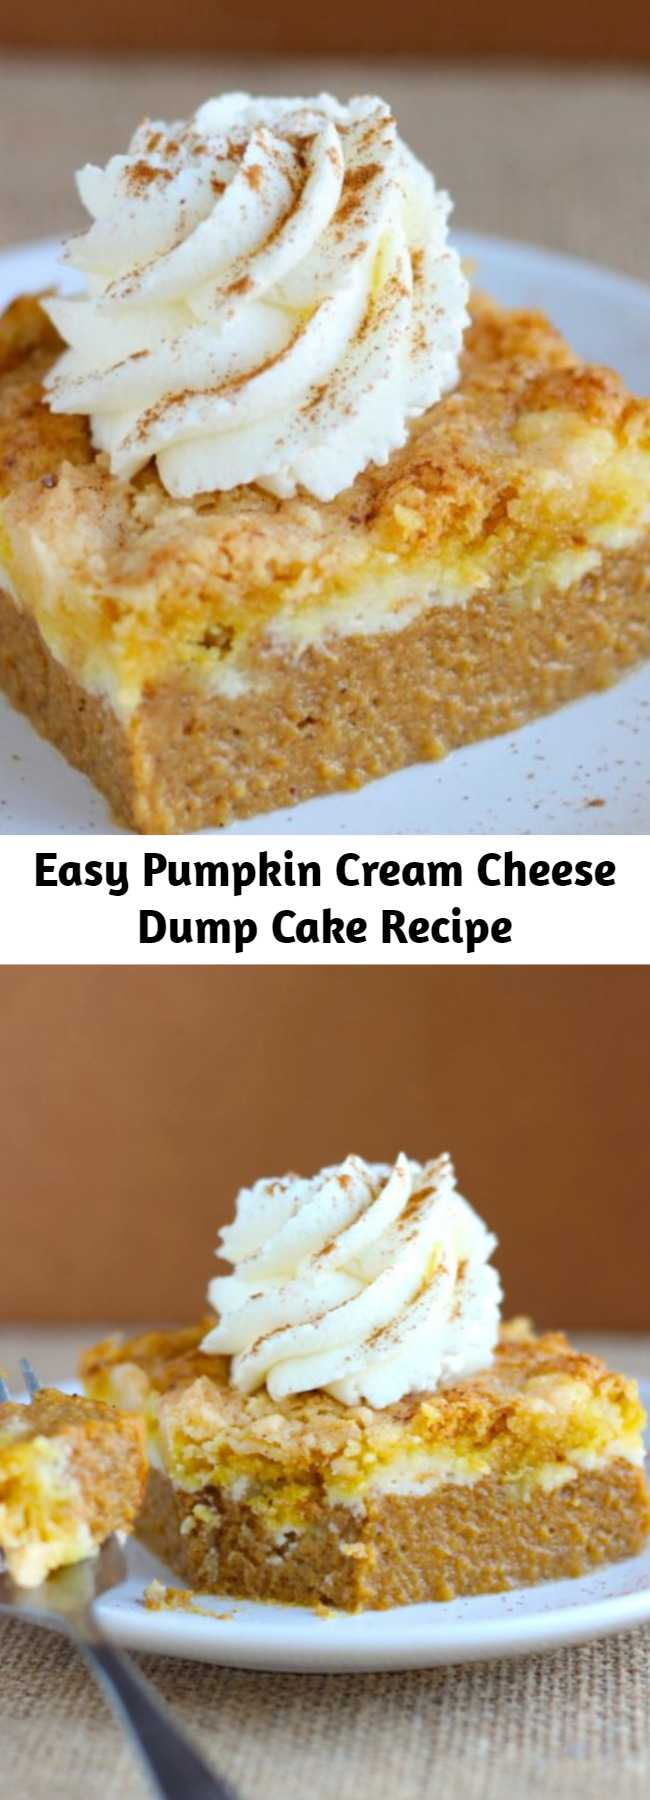 Pumpkin Cream Cheese Dump Cake Recipe - BETTER and way easier than pumpkin pie! This Pumpkin Cream Cheese Dump Cake is the best way to serve pumpkin pie to a crowd!